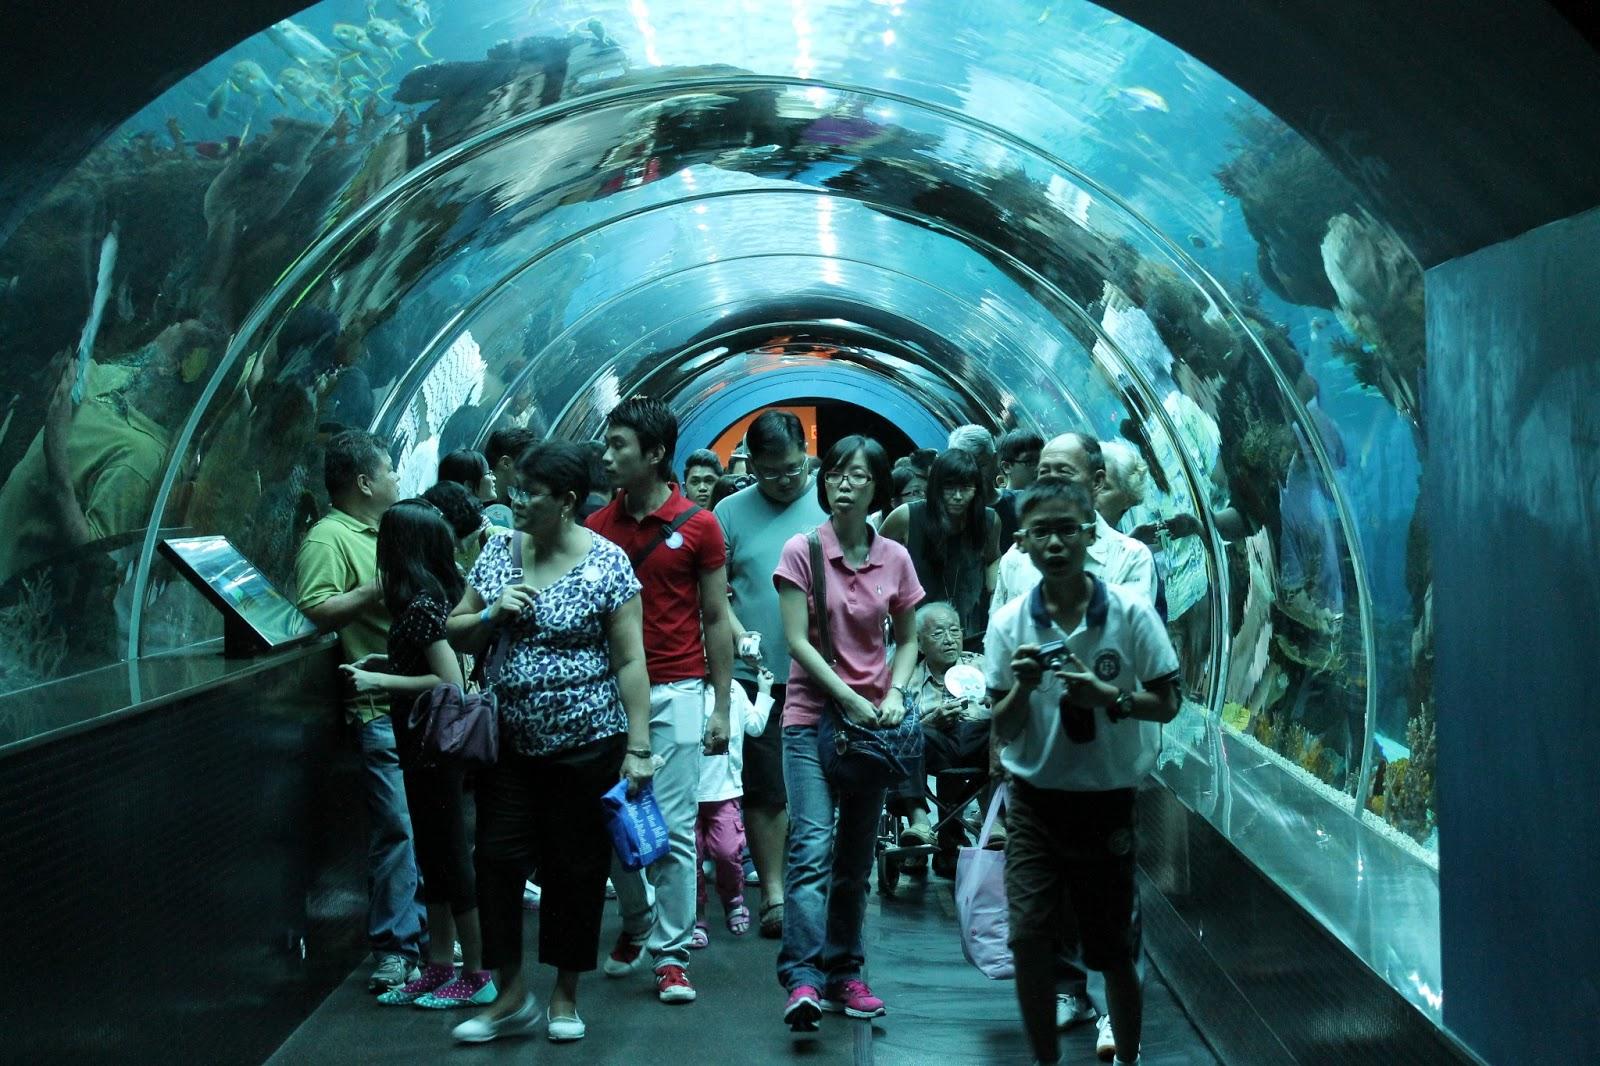 Minnesota Baby The World 39 S Largest Aquarium